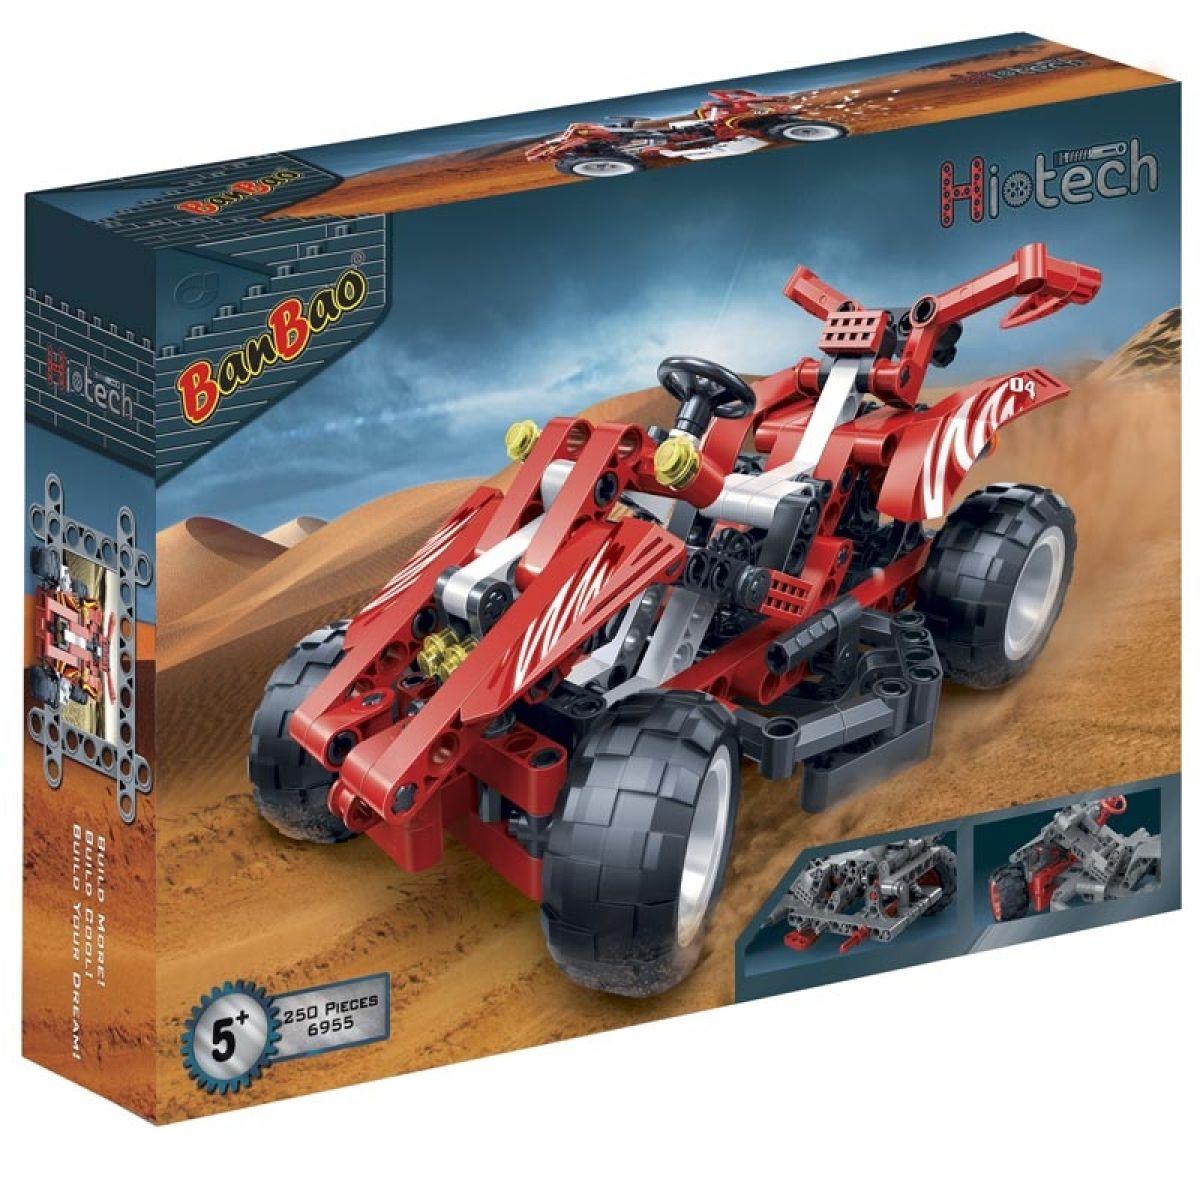 Banbao Hi-tech 6955 Auto racing 04